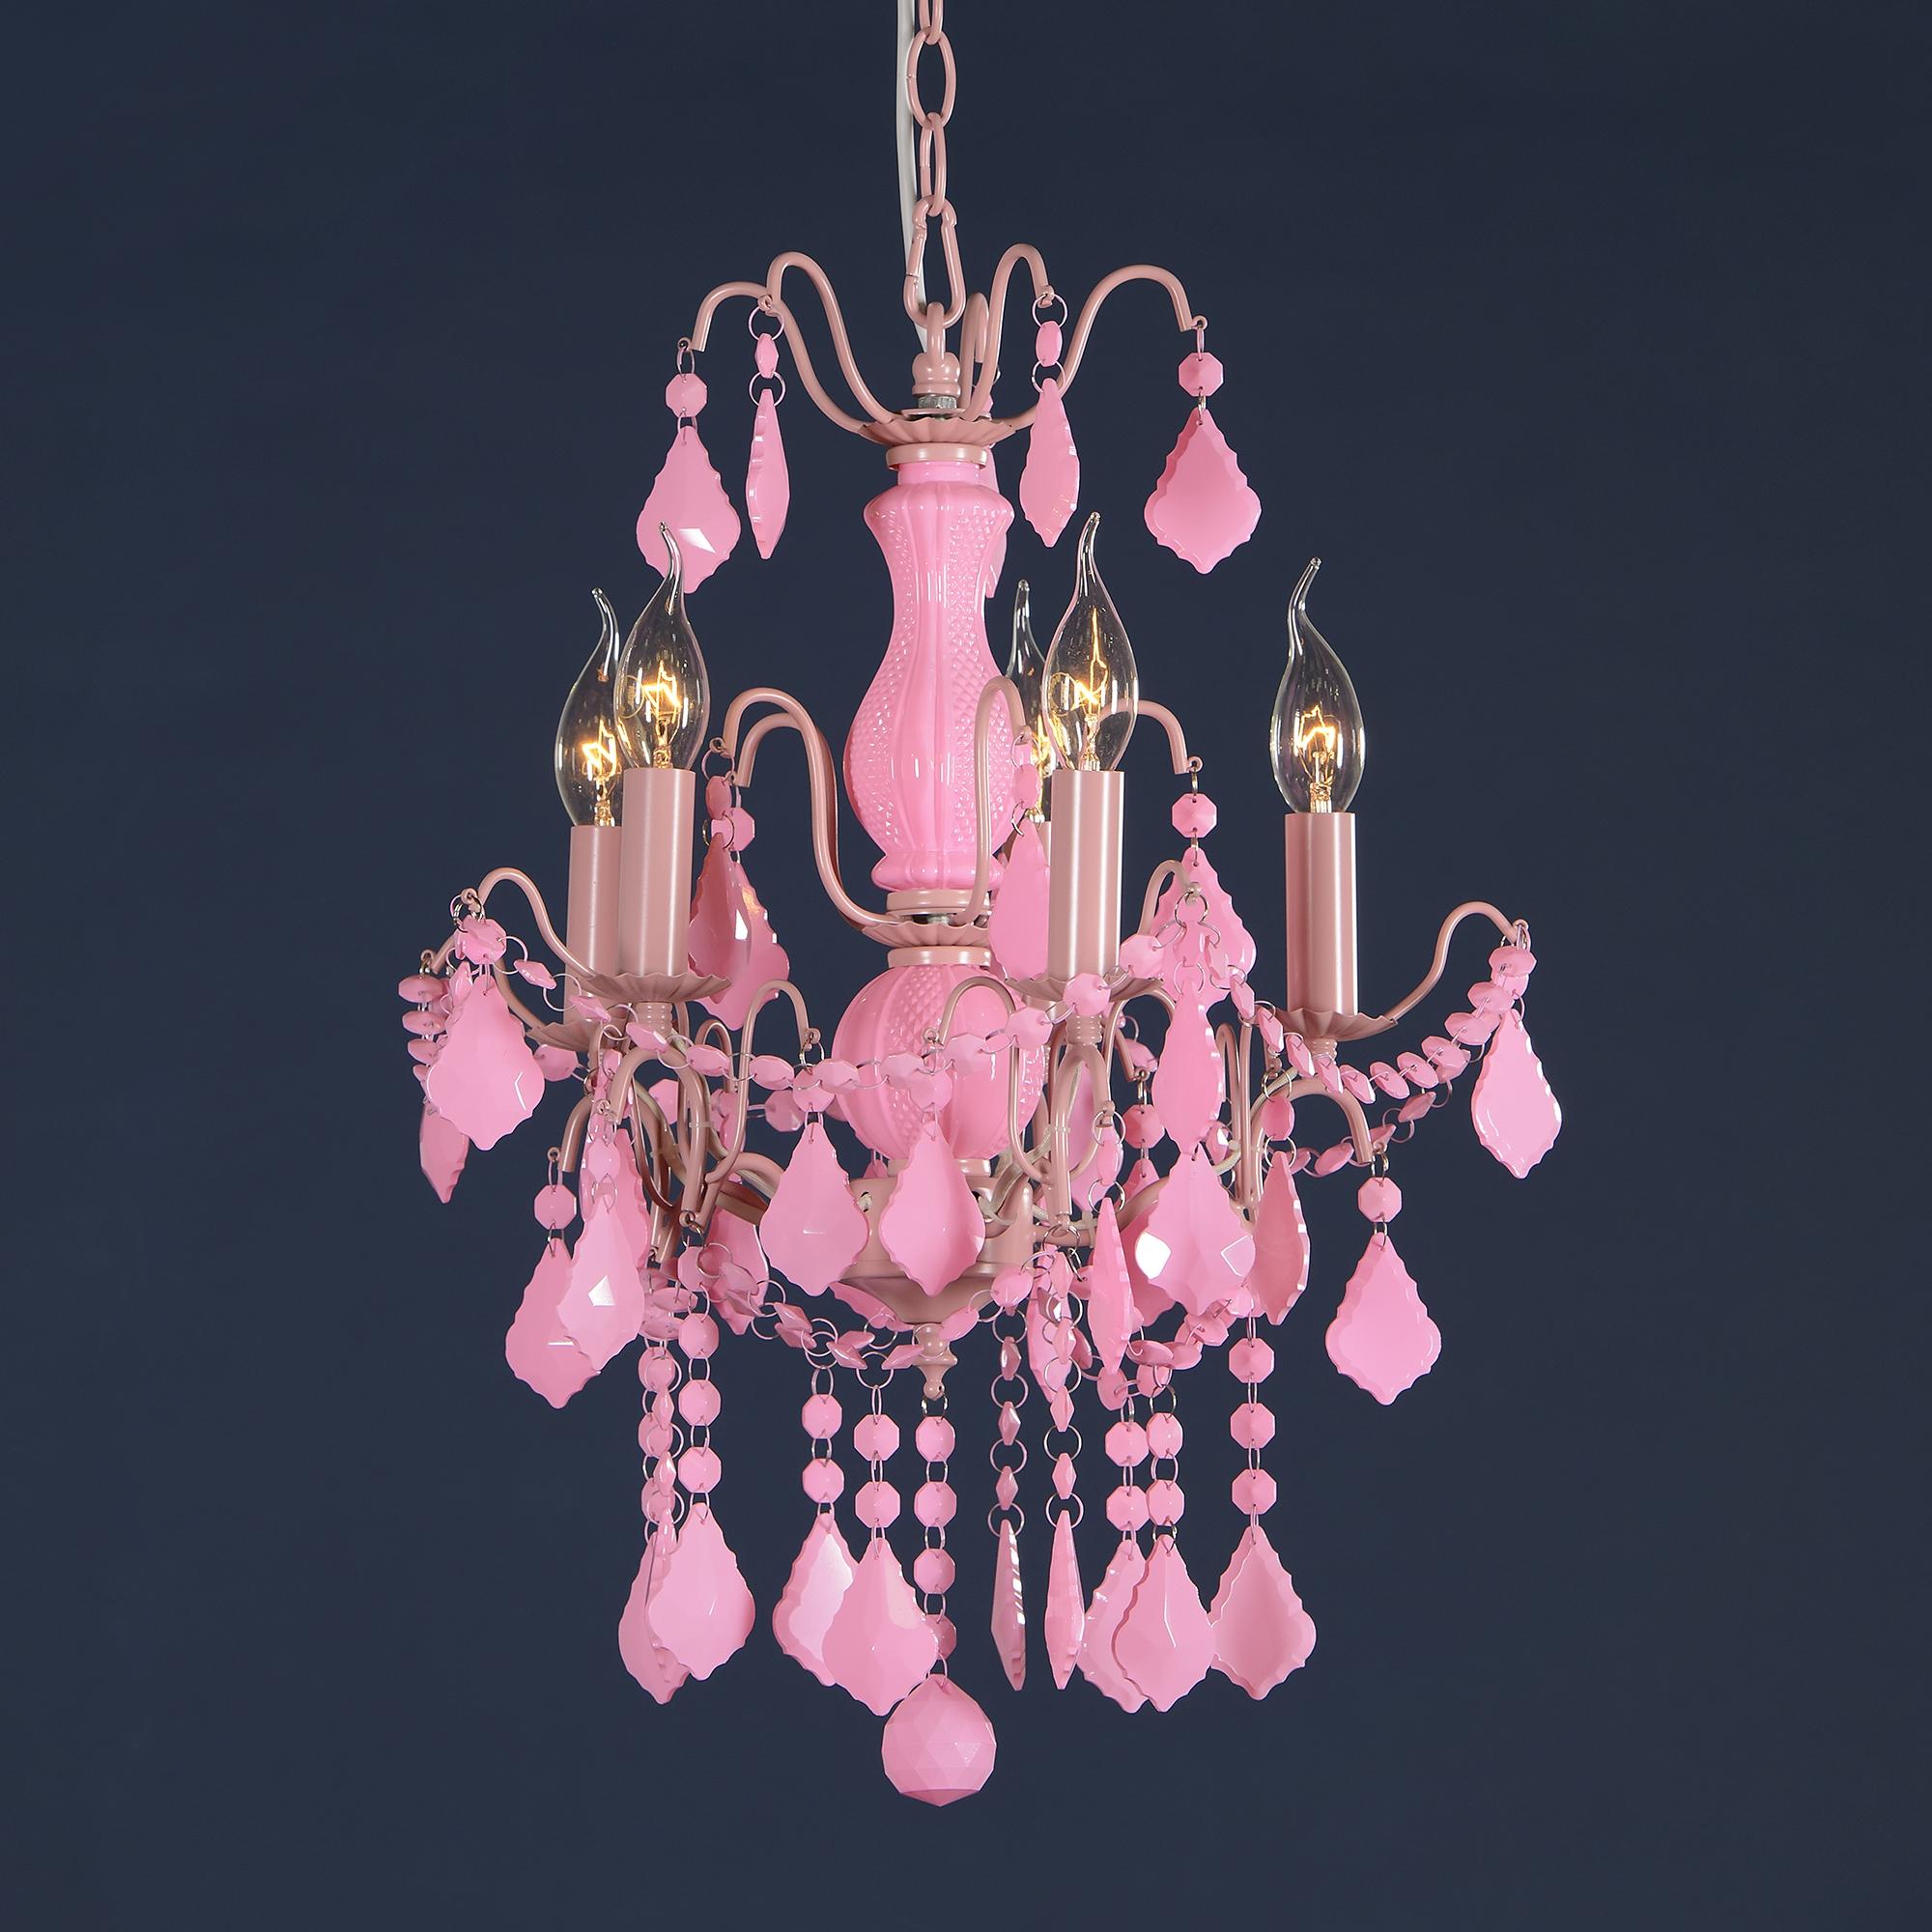 Charlotte 5 Light Chandelier - Pink